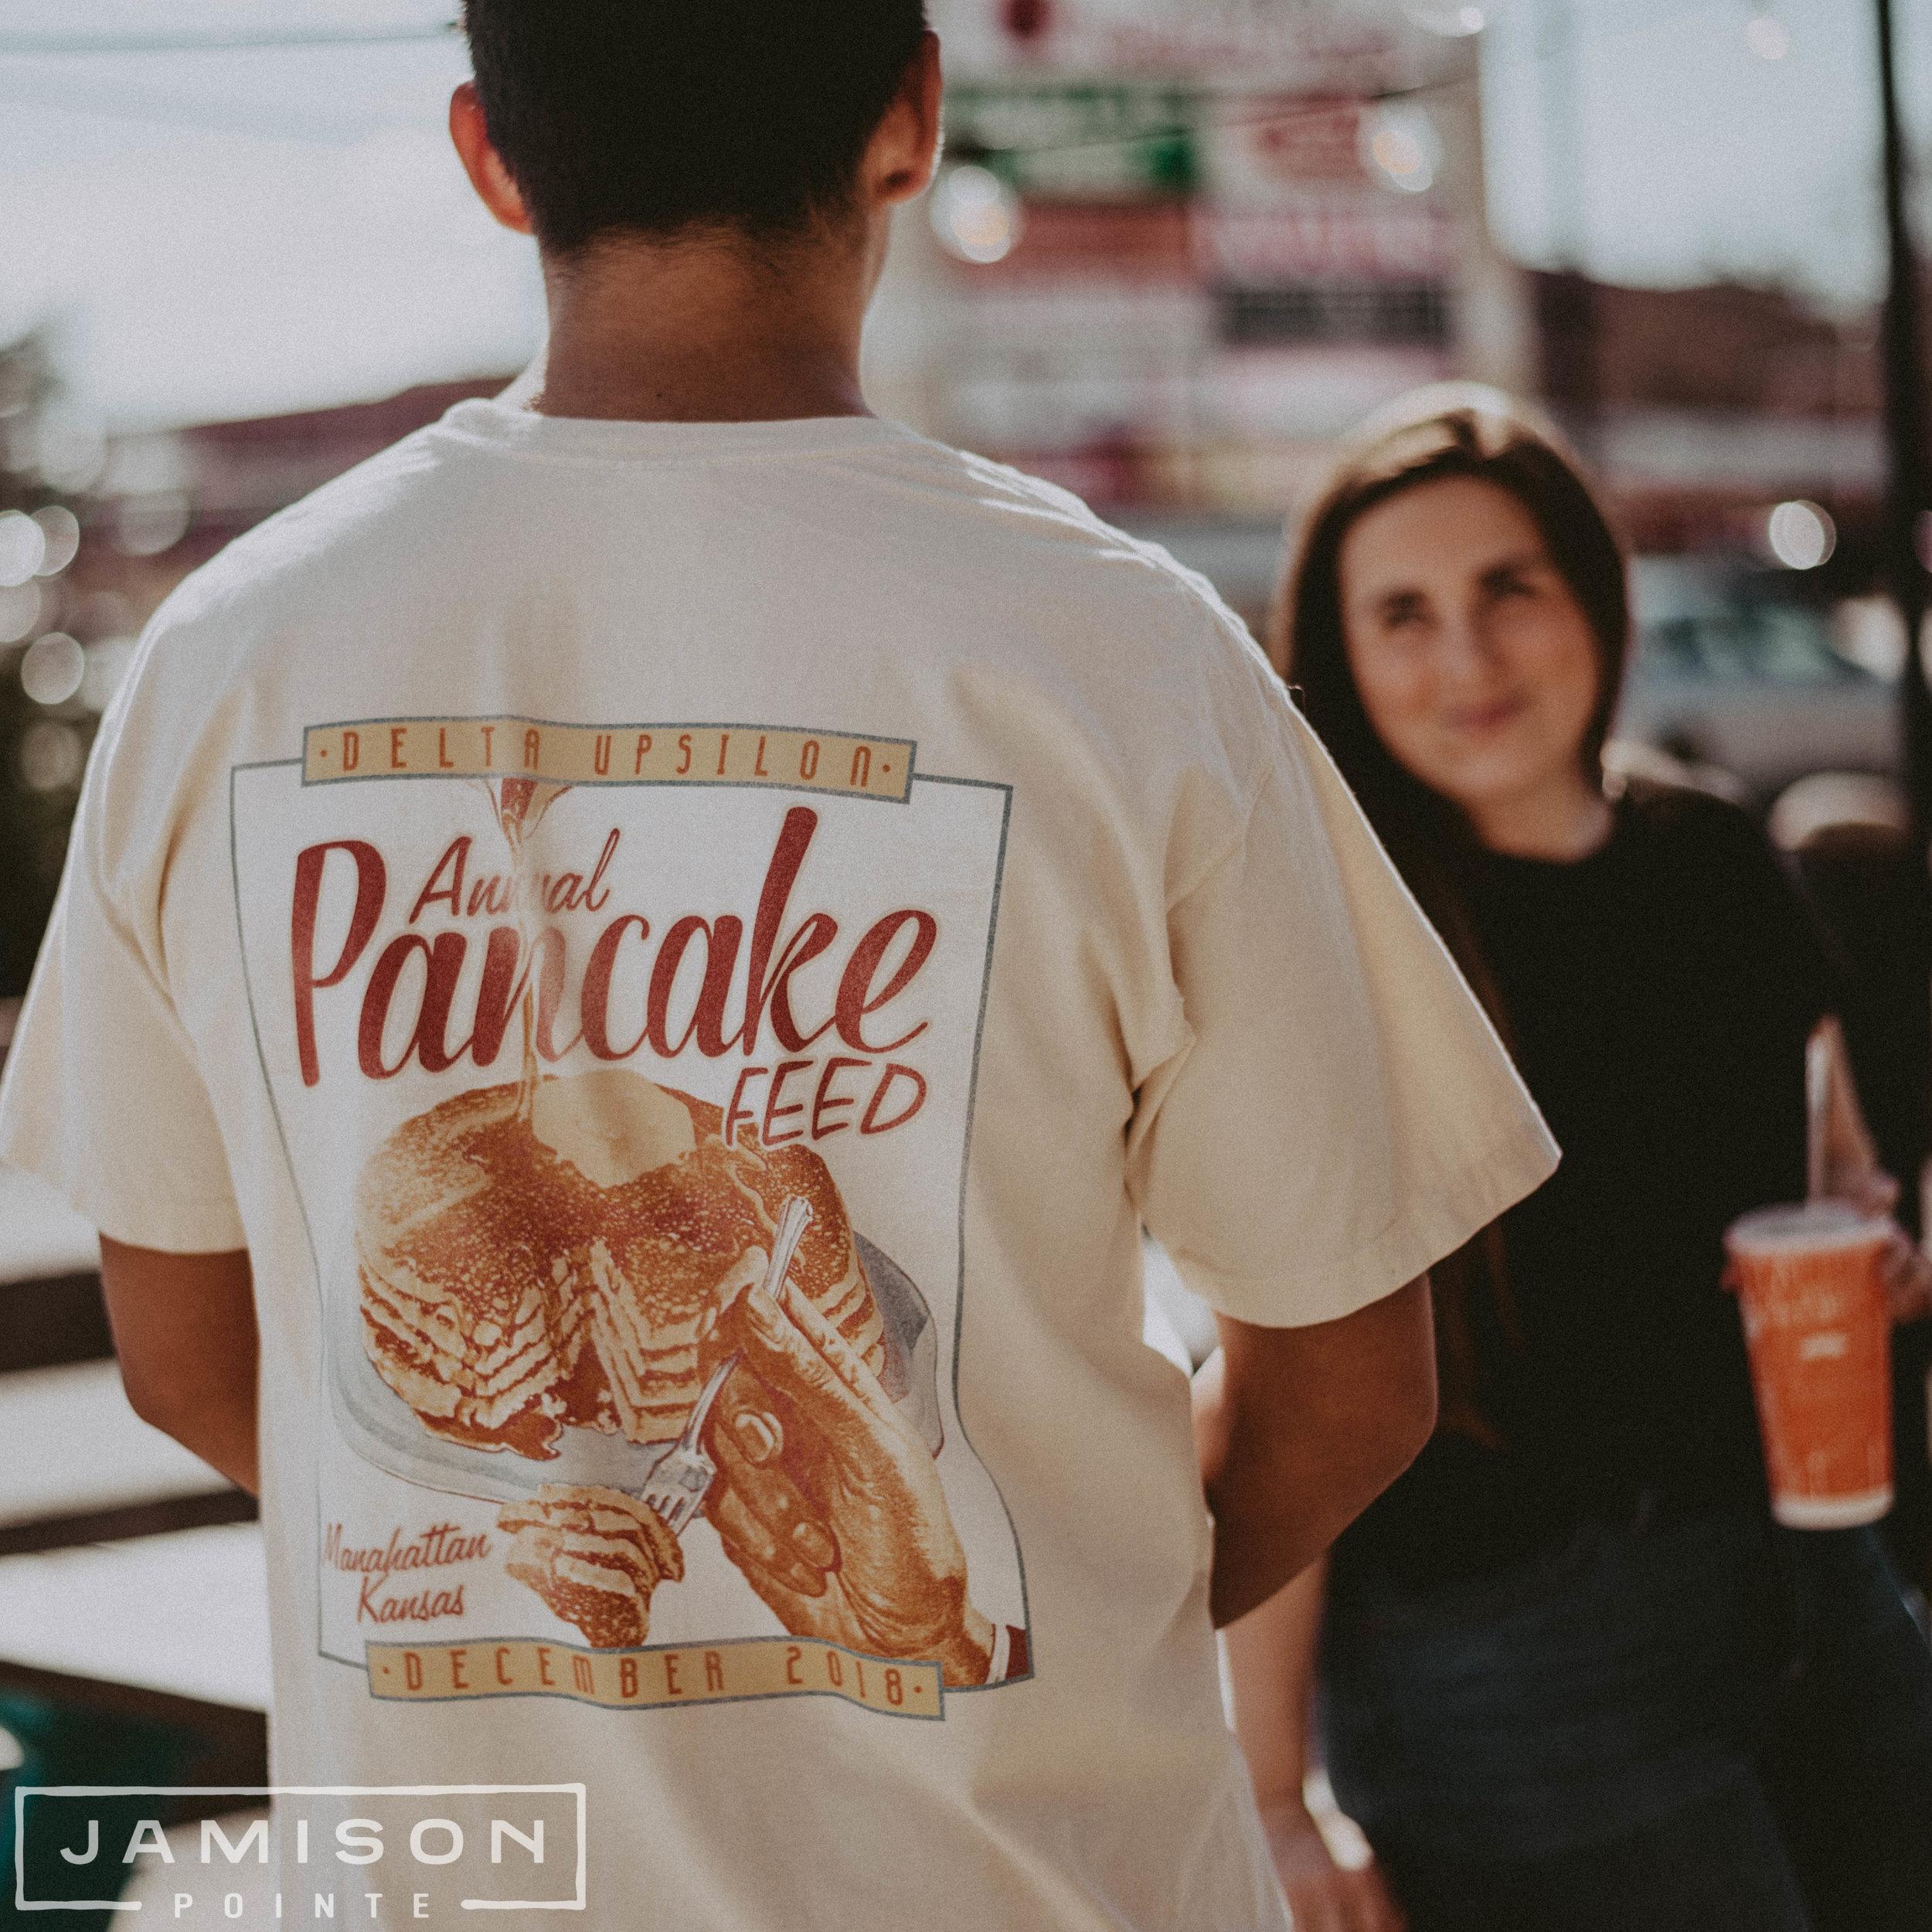 Delta Upsilon Pancake Philanthropy Tee